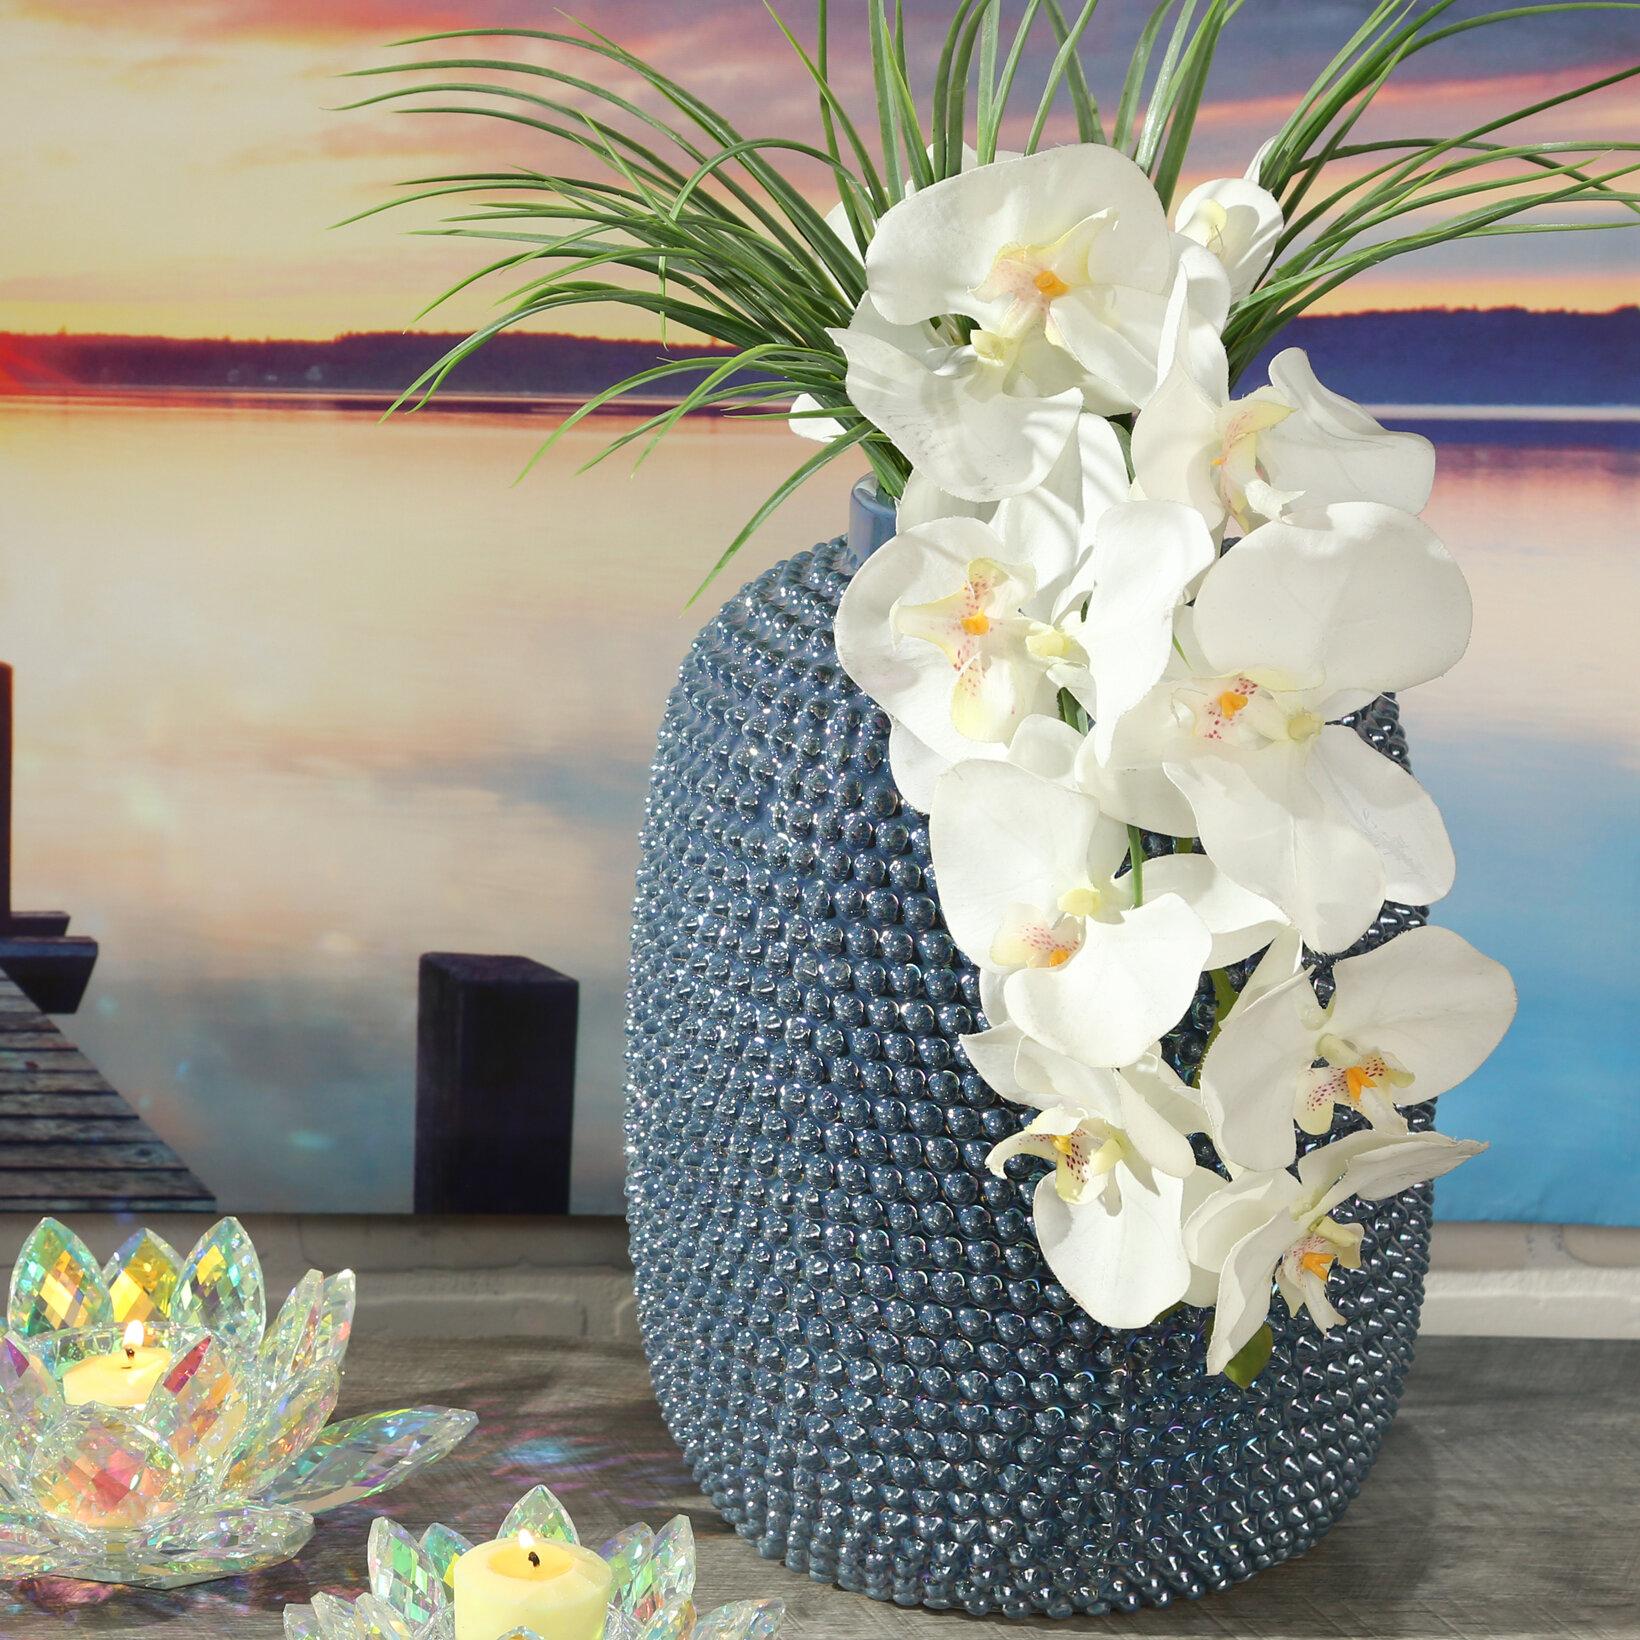 Rozier Decorative Ceramic Spike Table Vase Reviews Joss Main